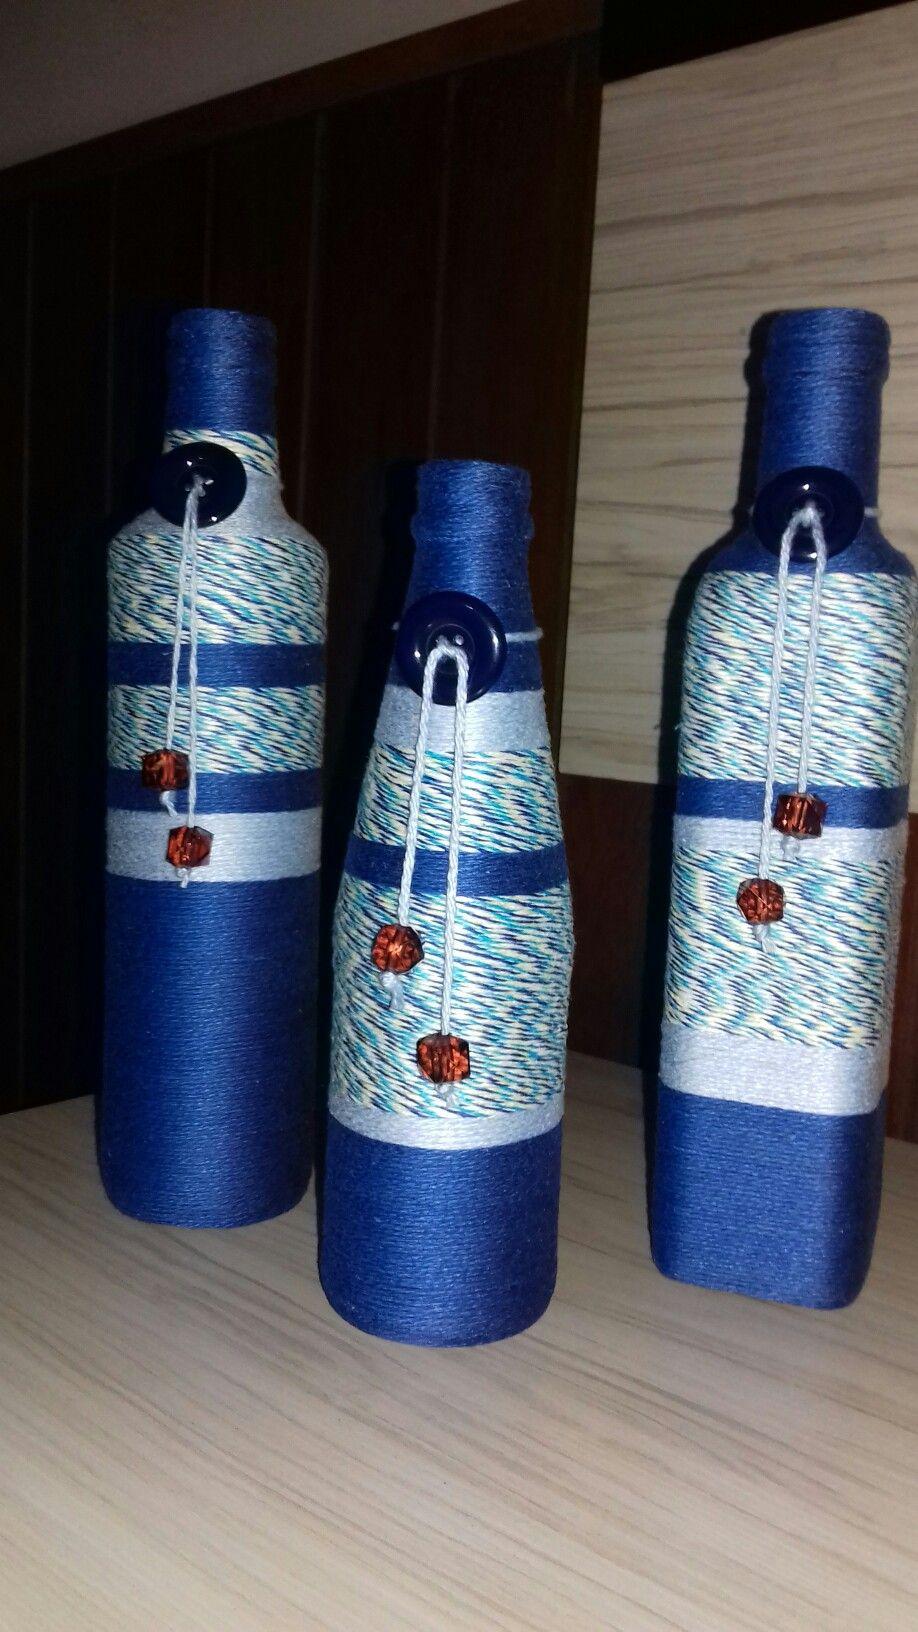 Decorated Bottles Garrafas decorada com barbante